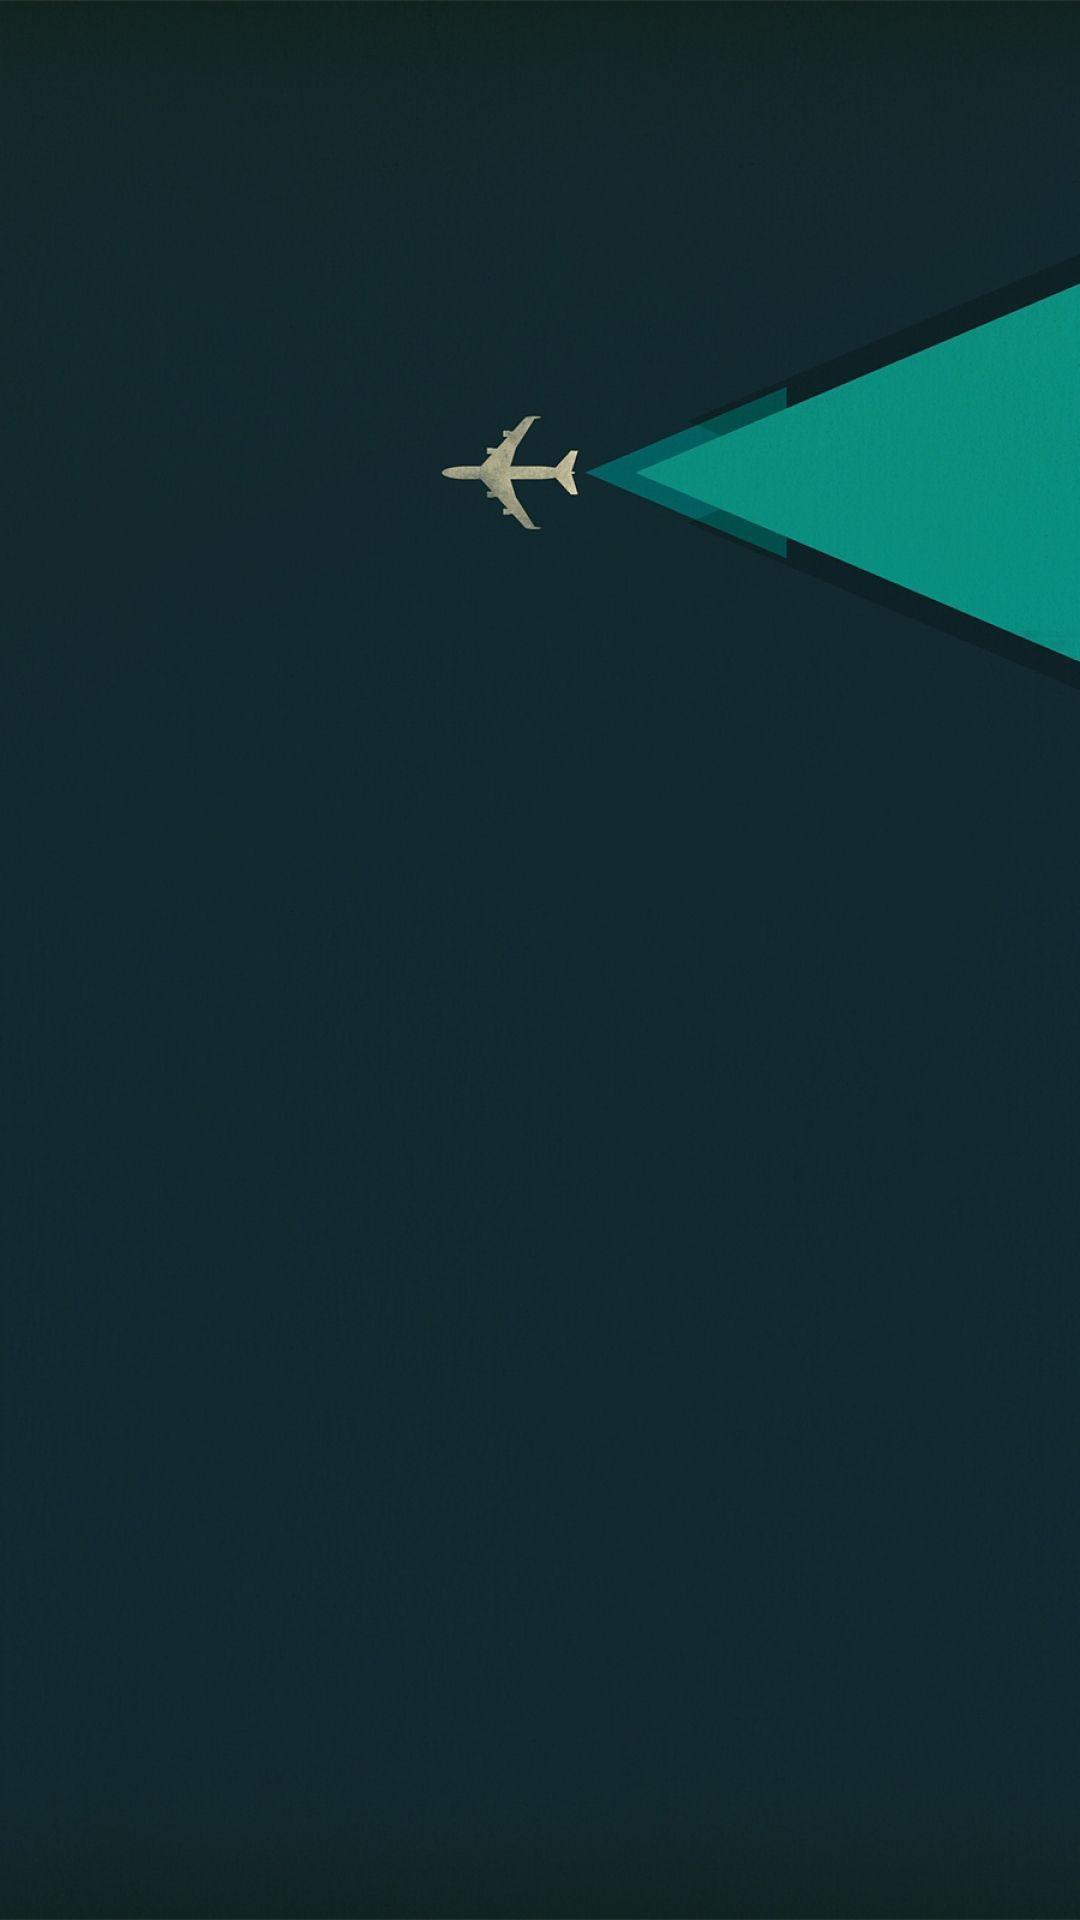 iPhone 11 Minimalist Wallpapers ...